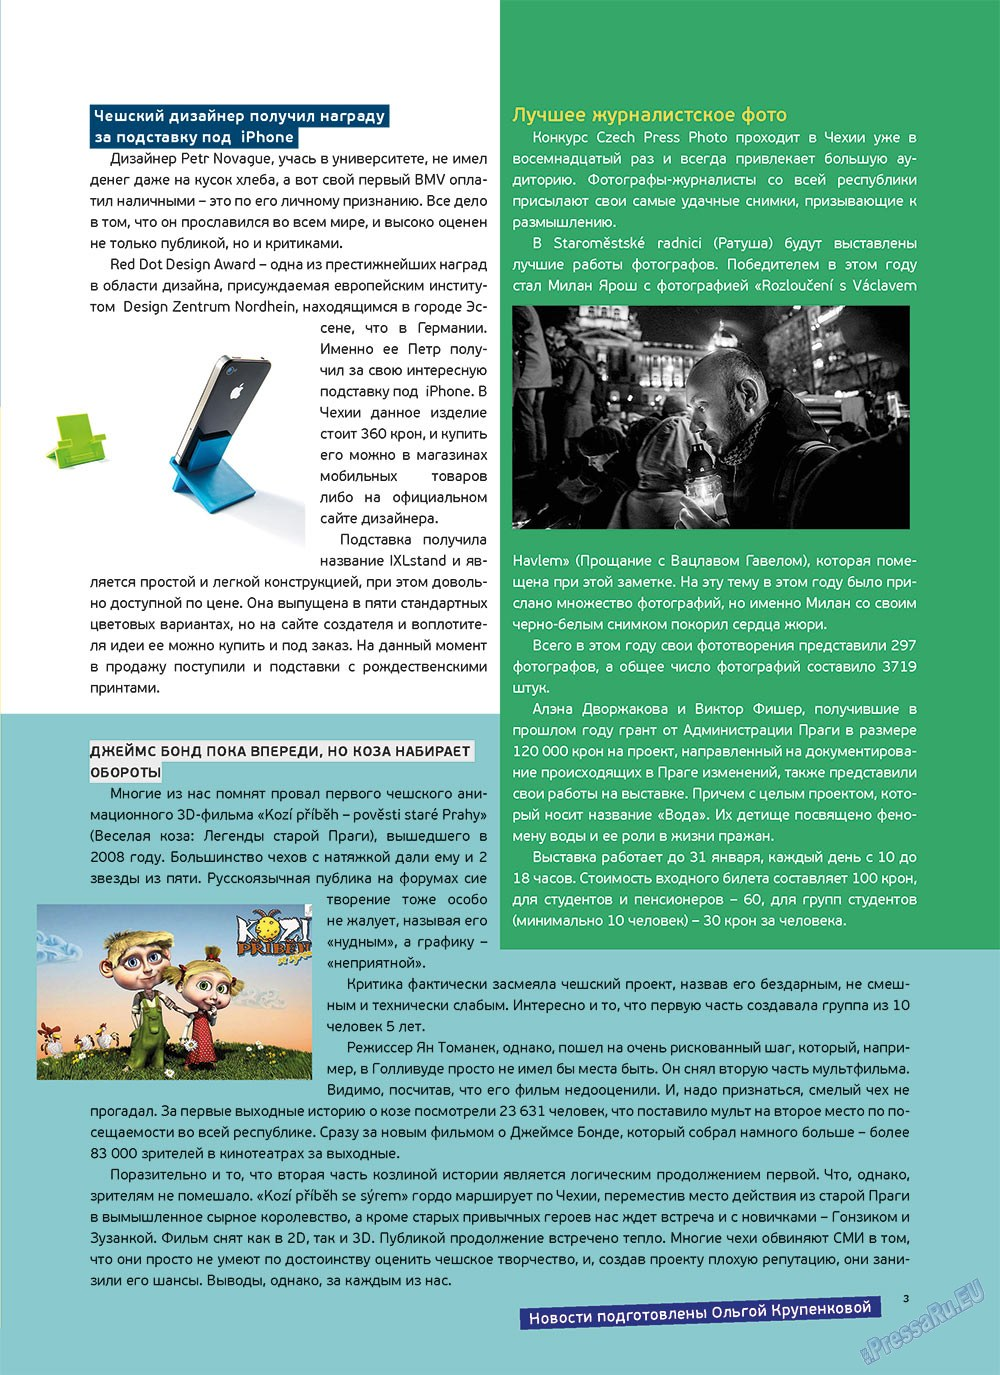 Артек (журнал). 2012 год, номер 5, стр. 5